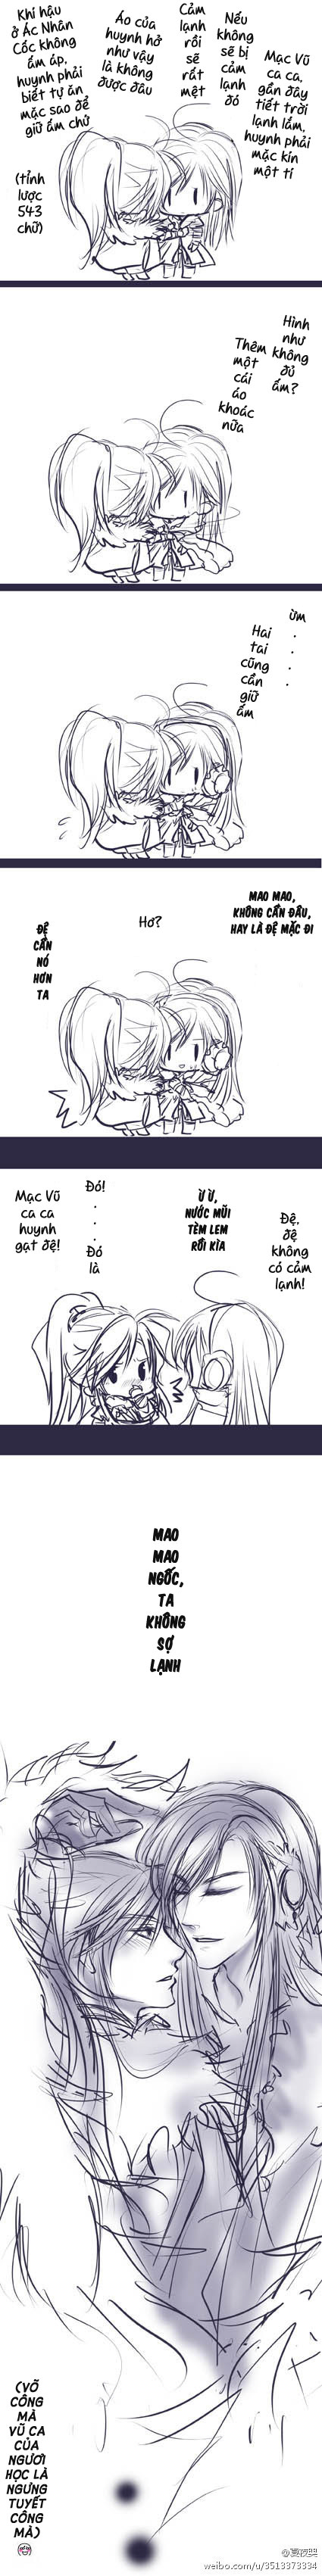 LongCanh2